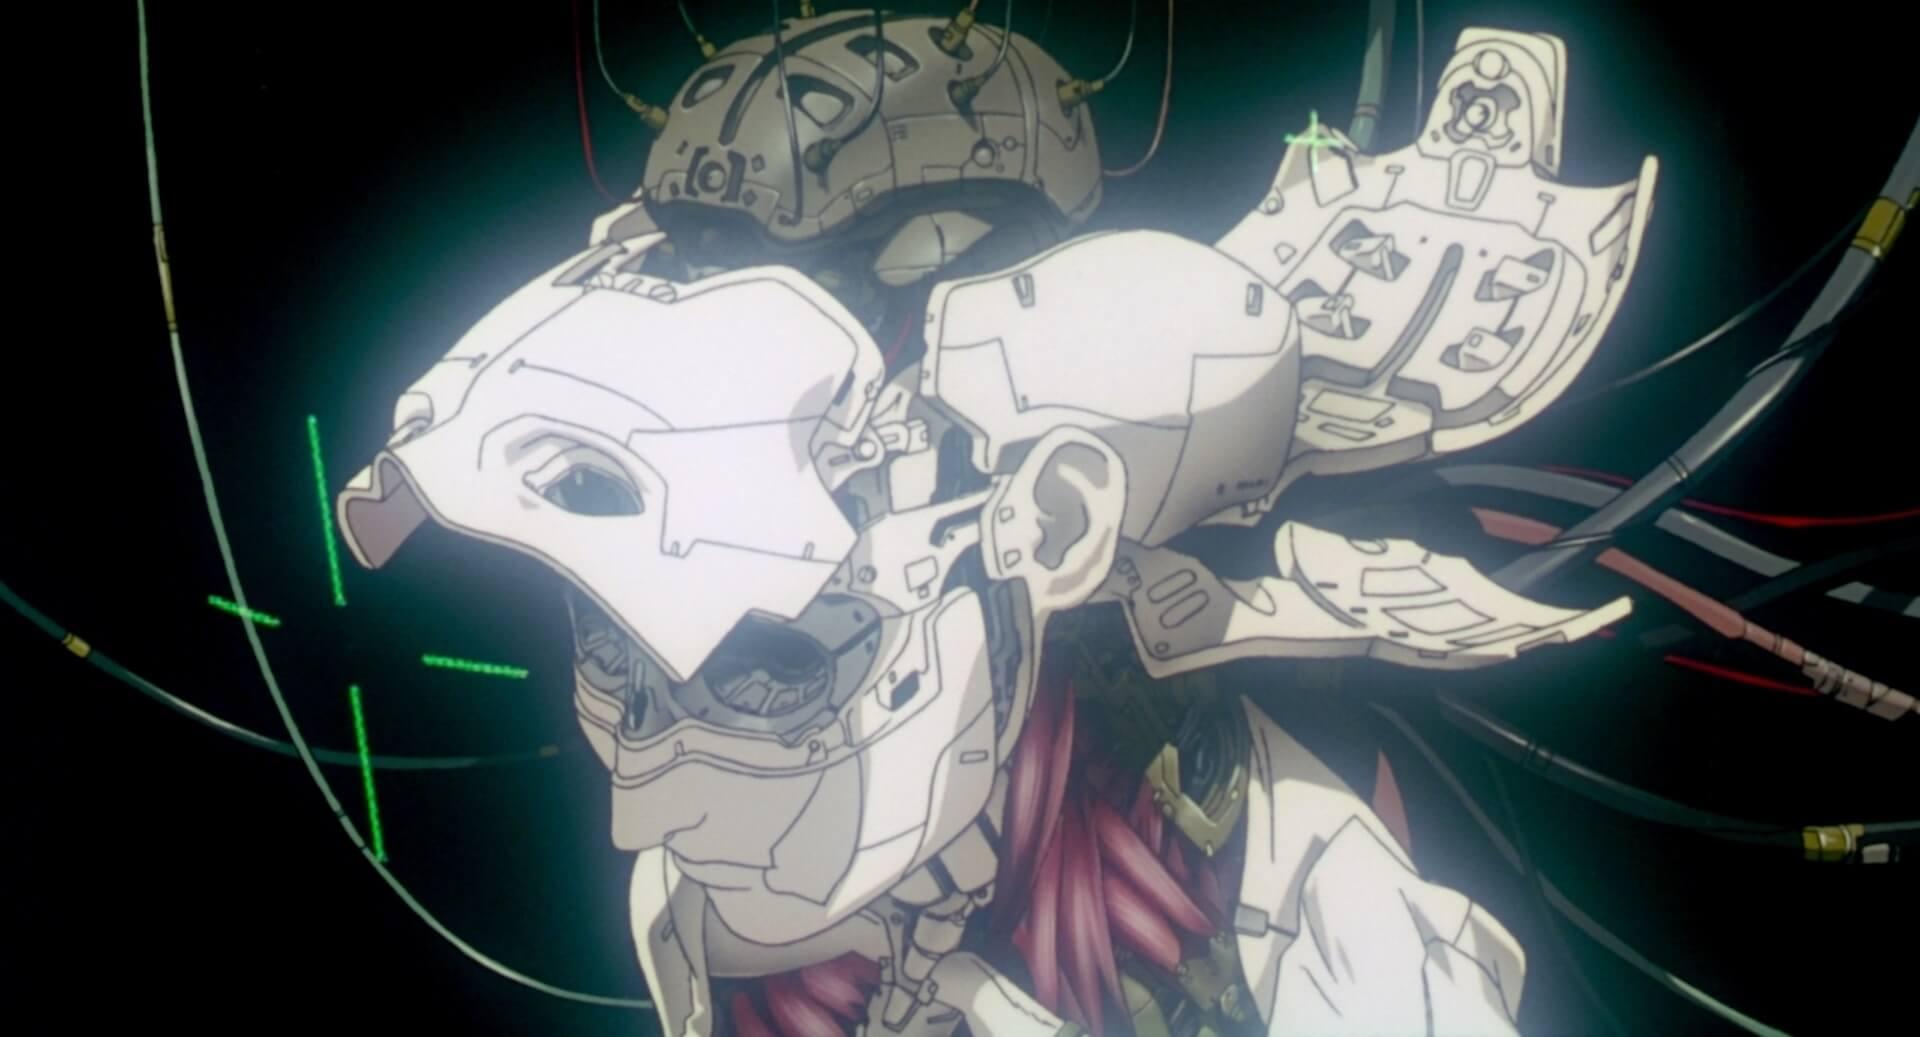 『GHOST IN THE SHELL/攻殻機動隊 4Kリマスター版』がIMAX&通常上映決定!押井守からのコメントも film210820_ghostintheshell_imax_9